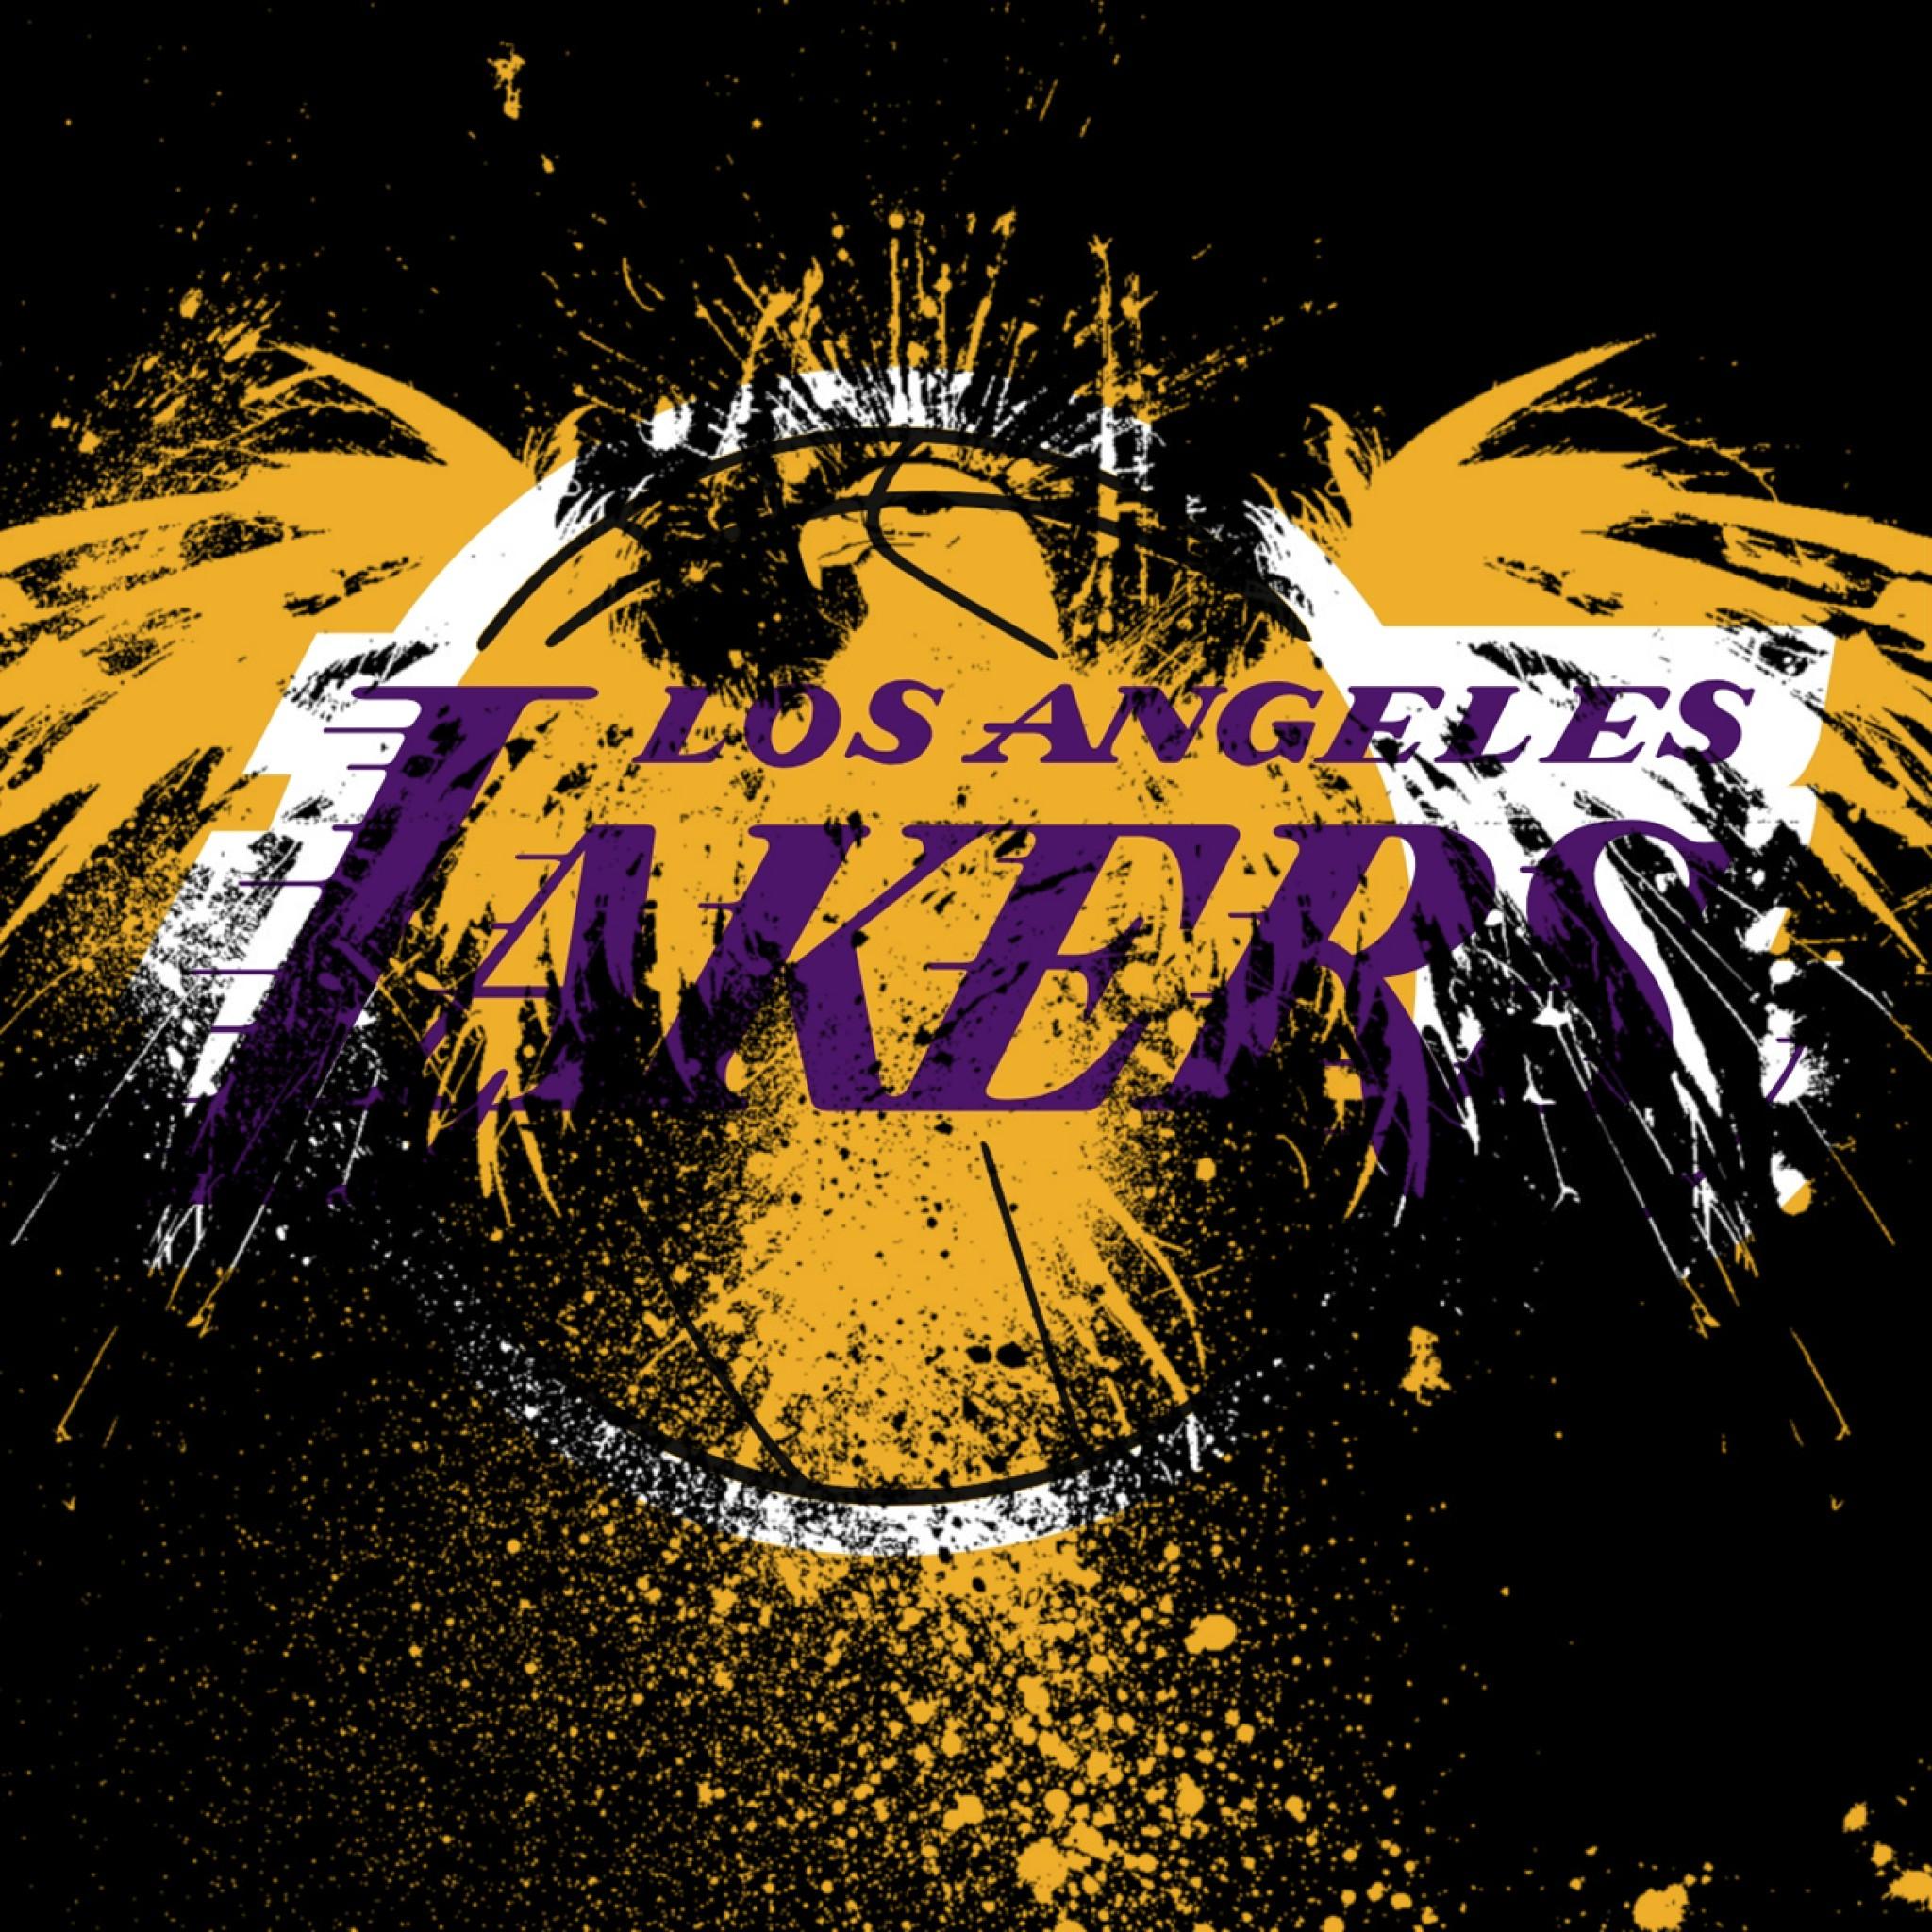 Los Angeles Lakers: Lakers Logo Wallpaper